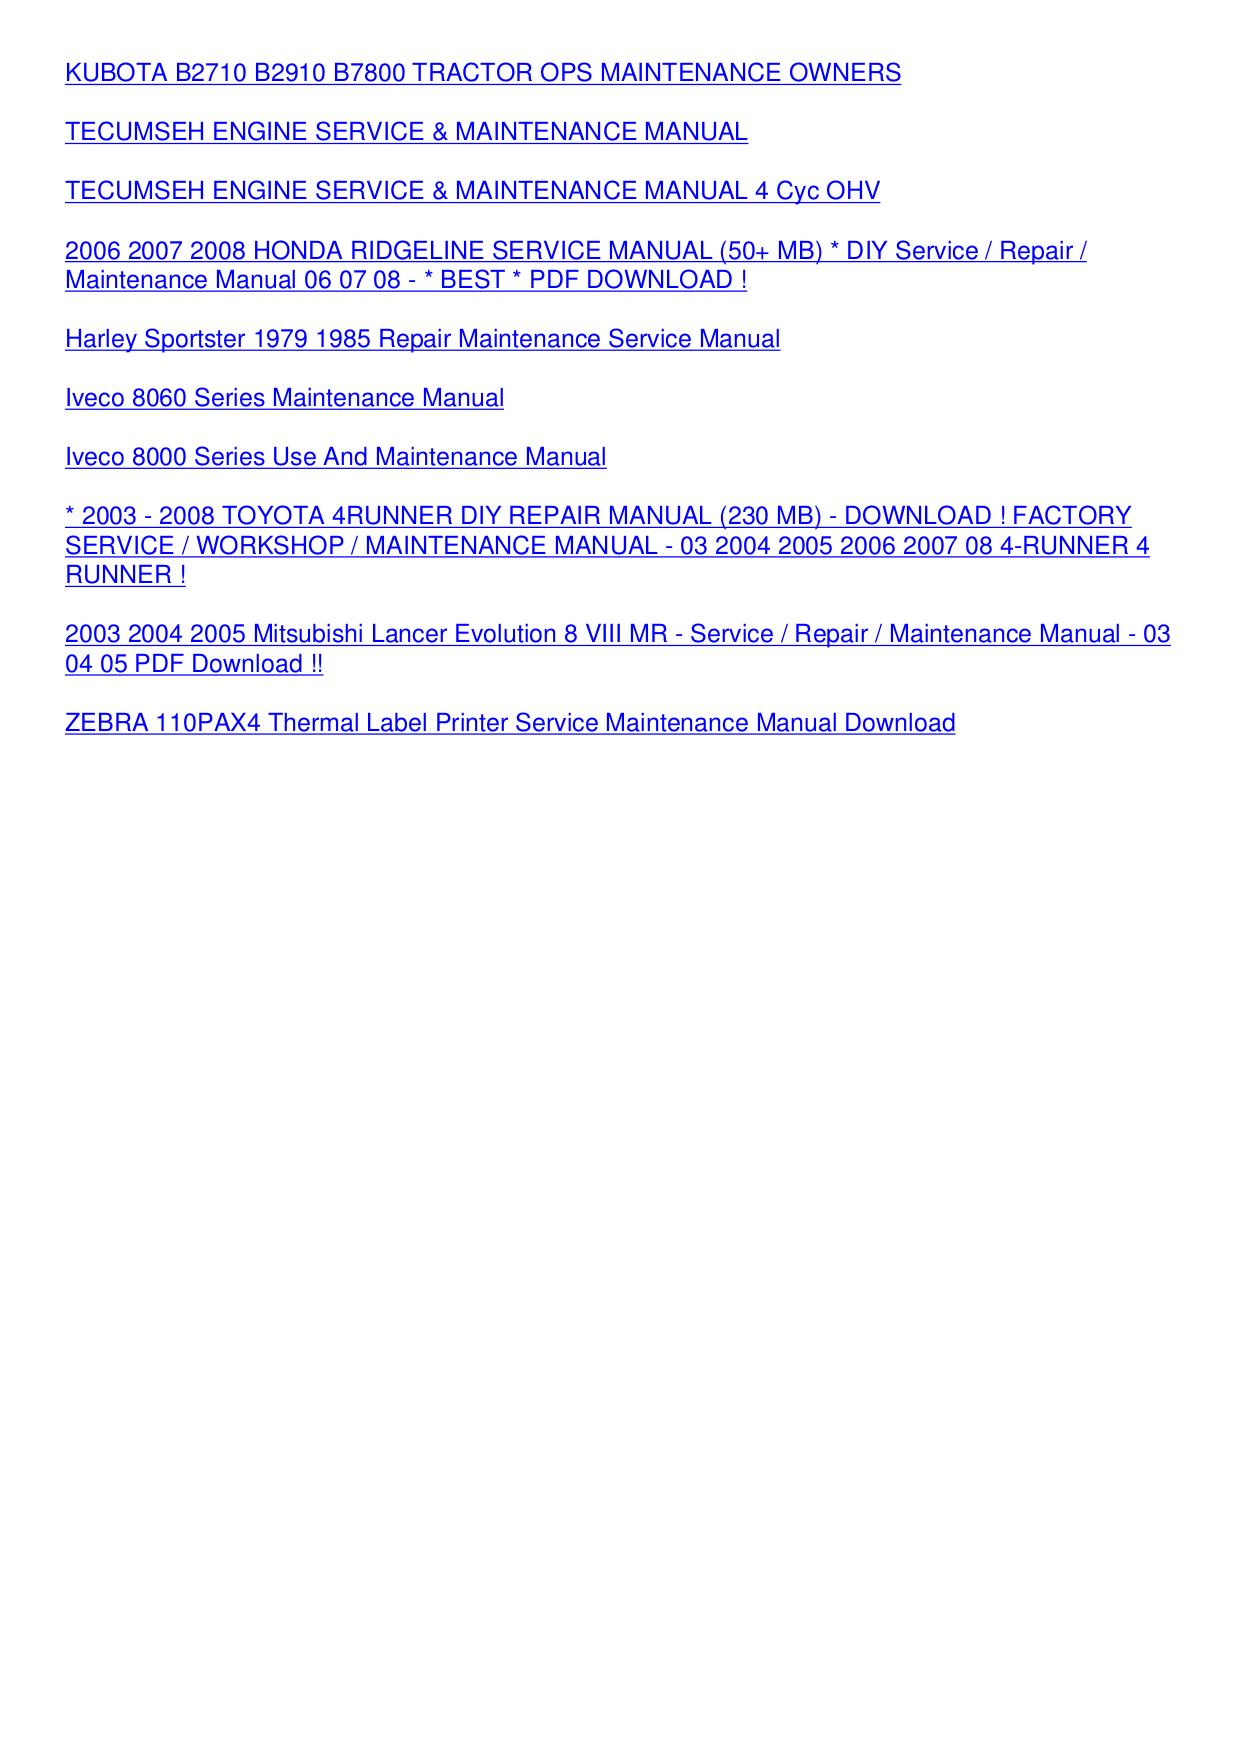 panasonic hc v520 v510 service manual and repair guide